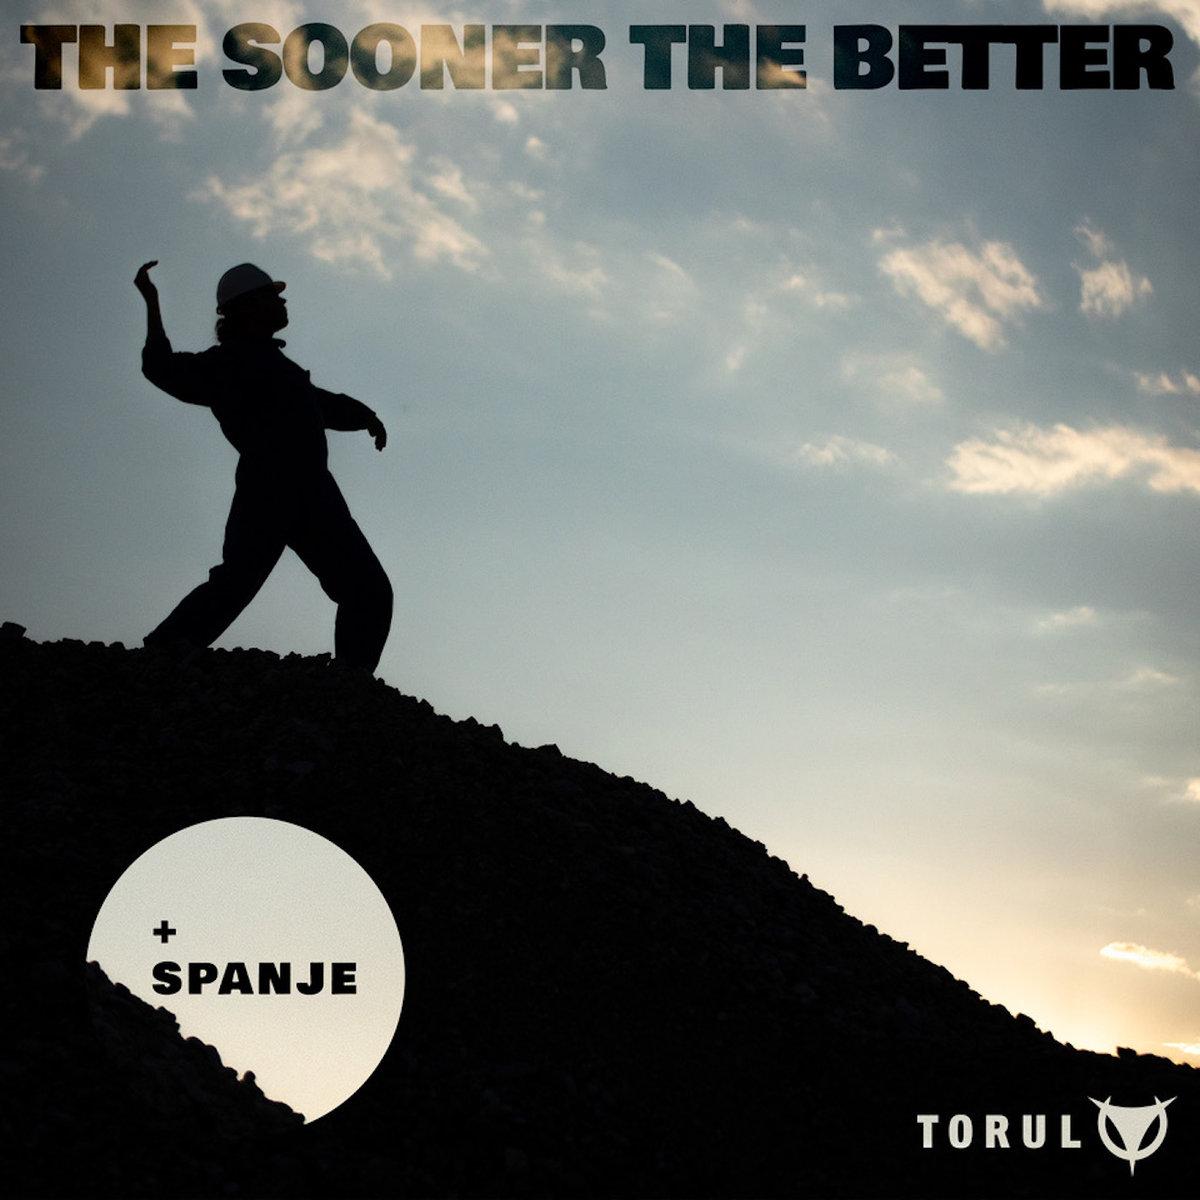 Electro News @ – Torul – The Sooner the Better